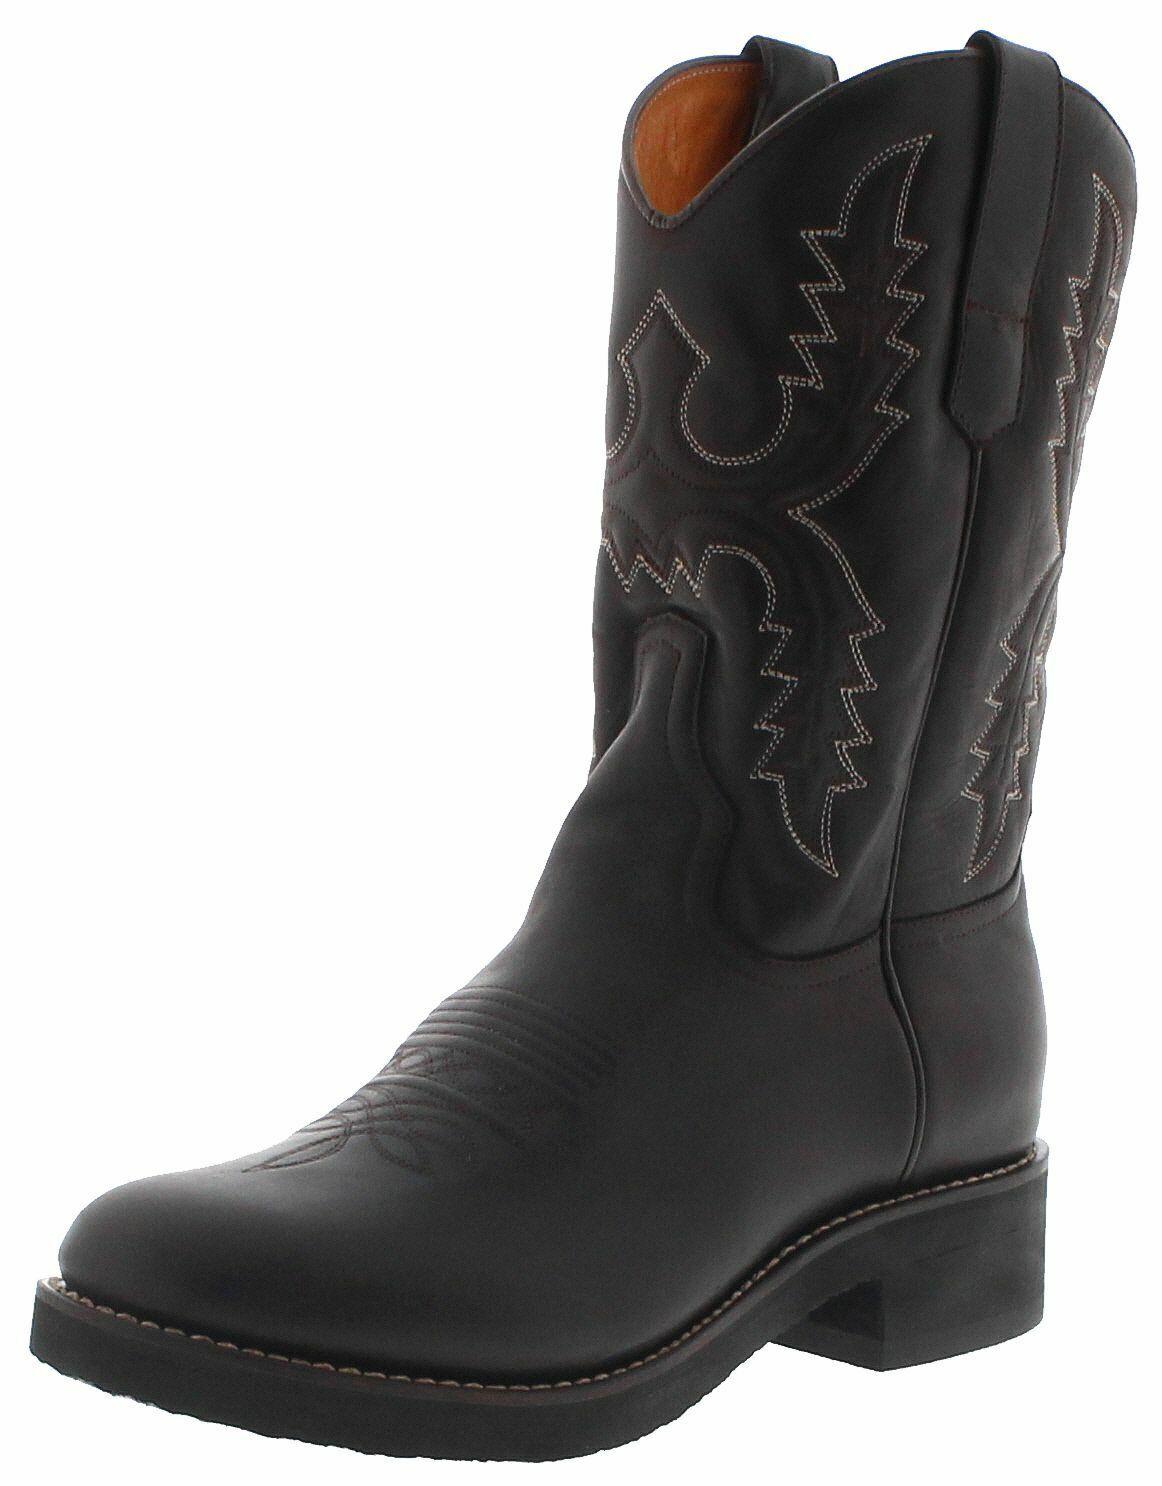 Sendra stivali 11615 CAFE Uomo Cowboy Stivali Stivali Western MONTALA Marronee